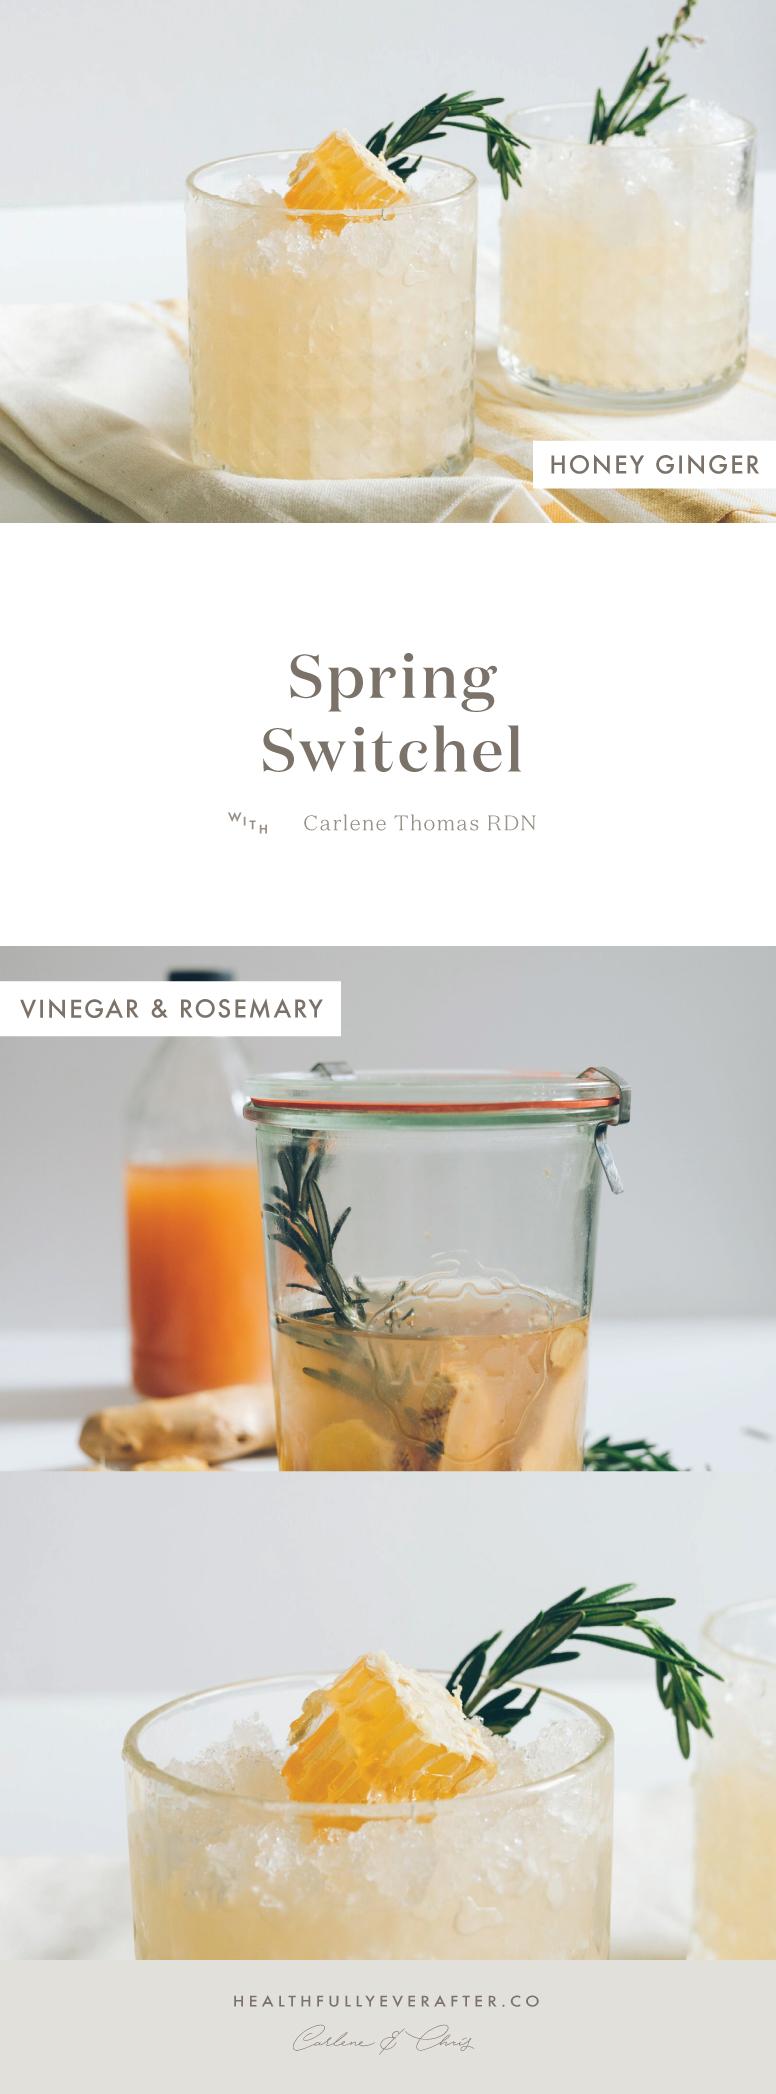 spring switchel drink